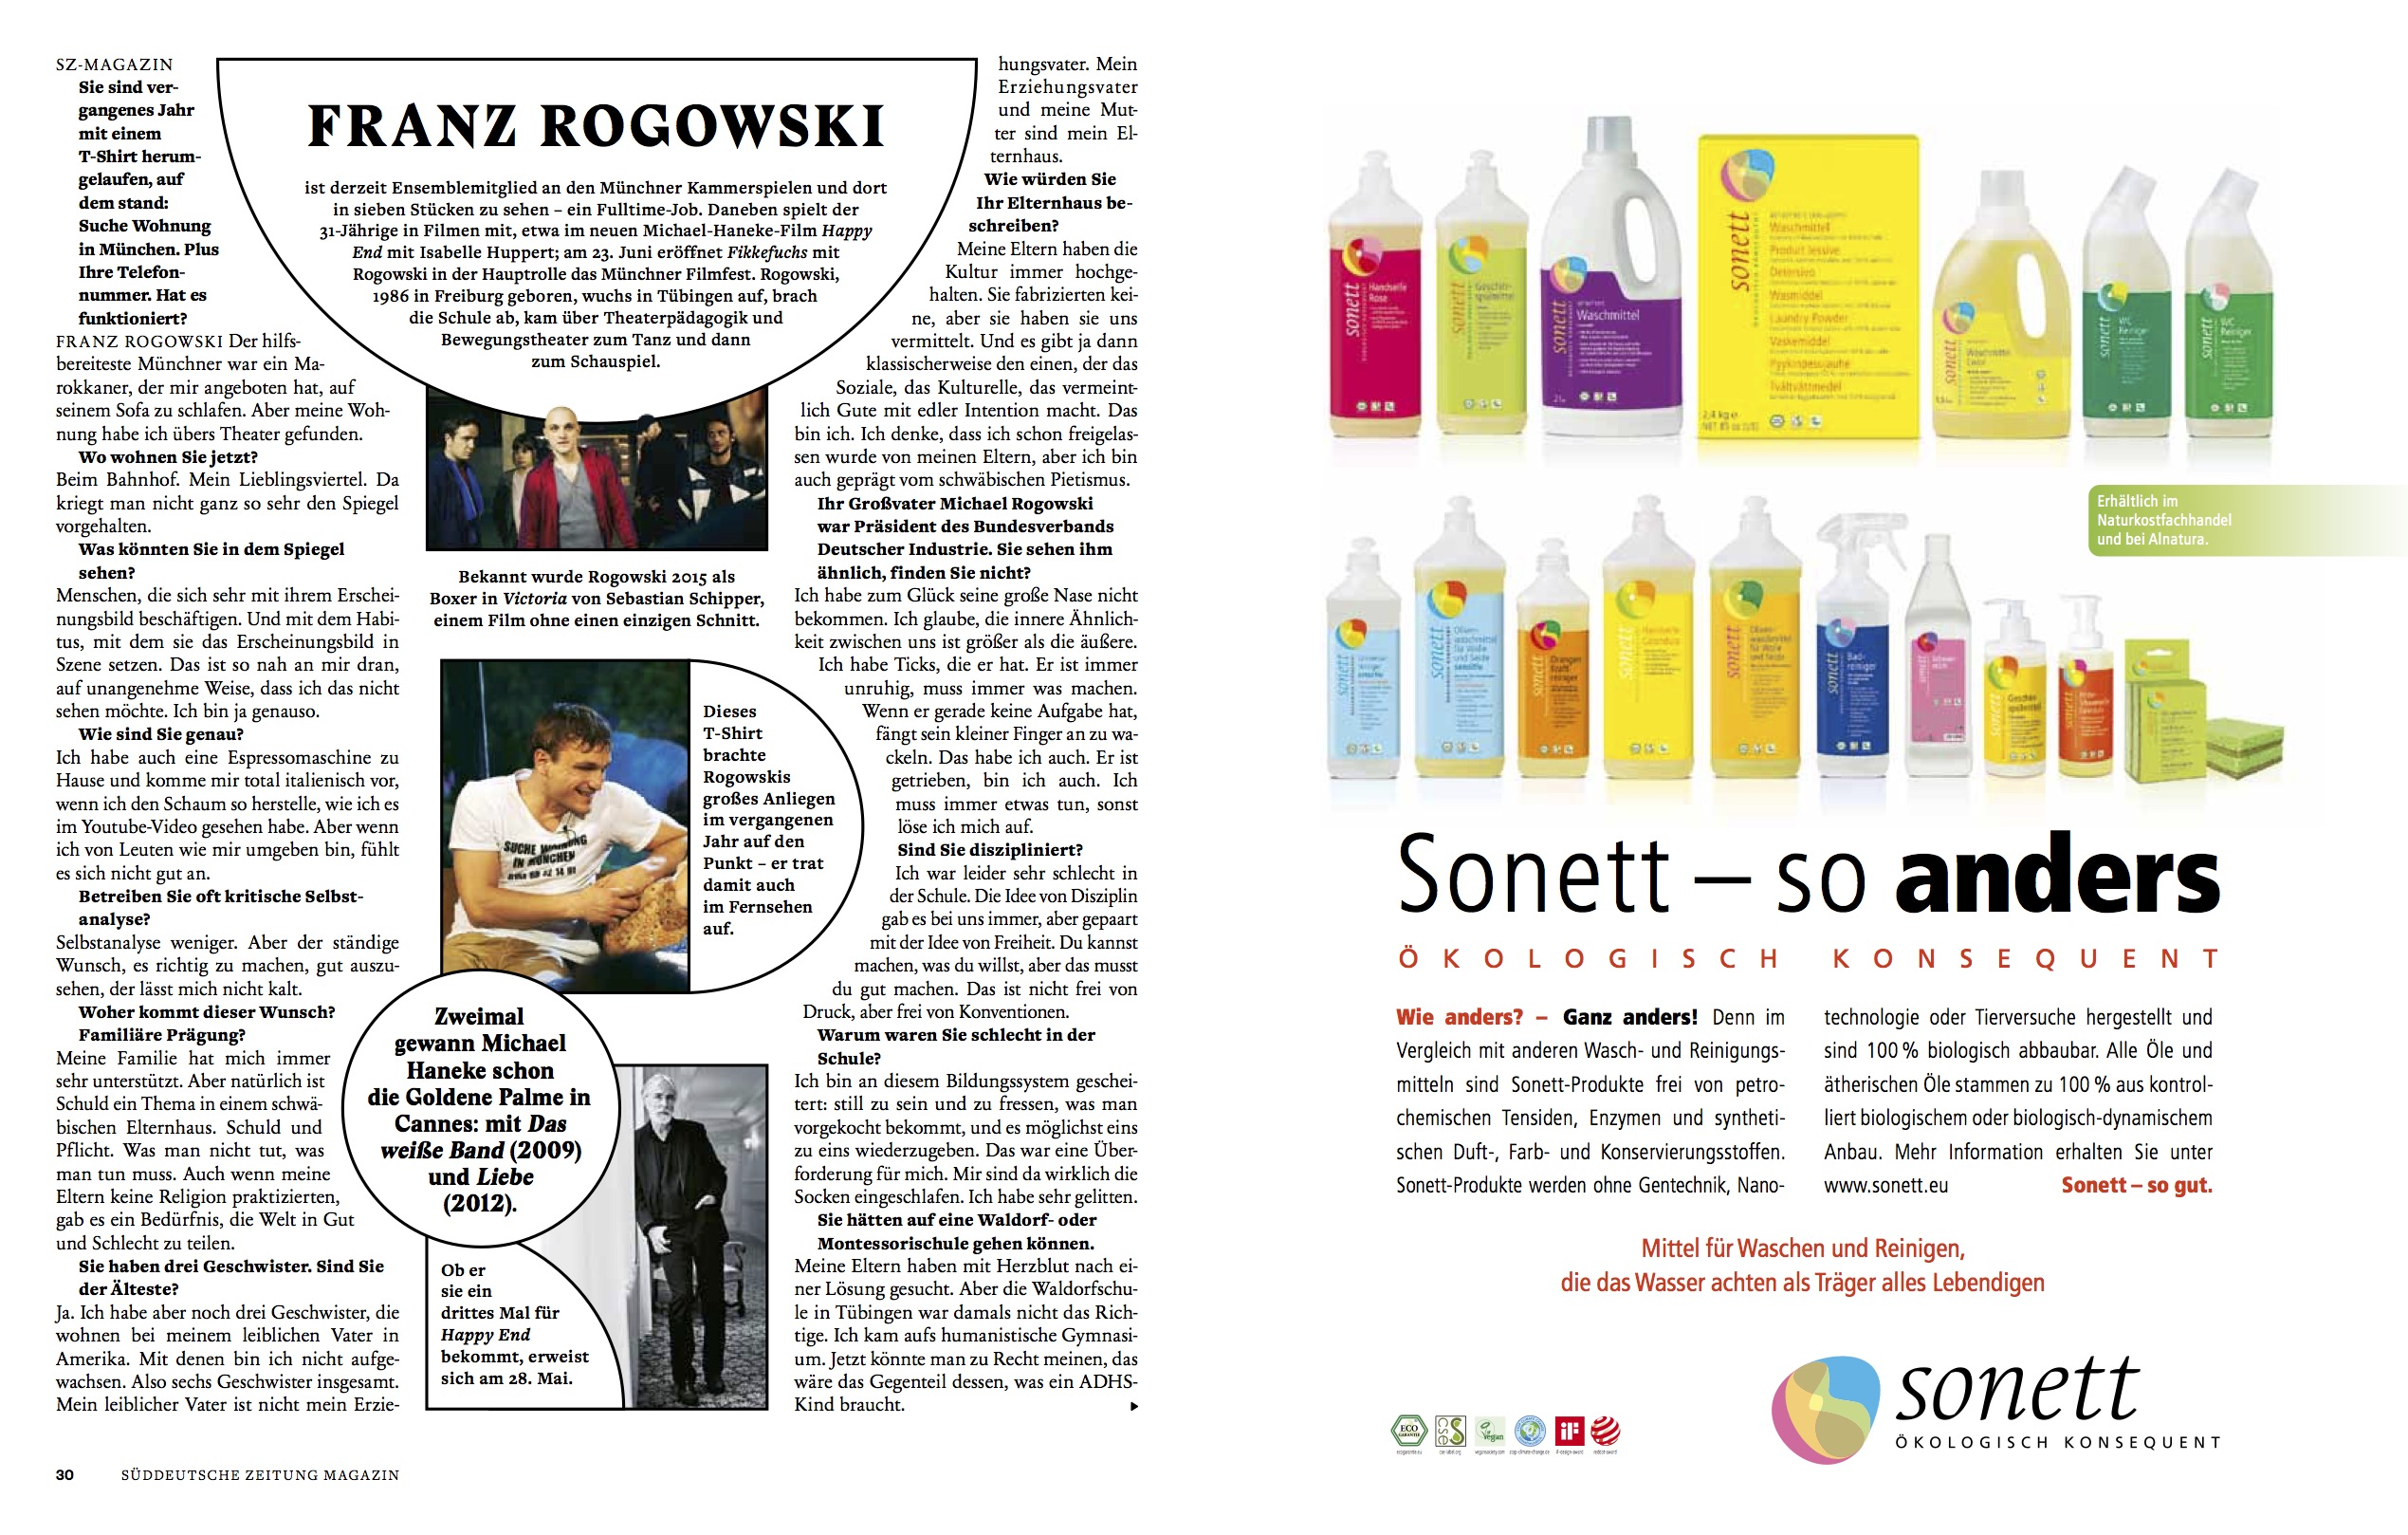 Franz Rogowski @ SZ Magazin